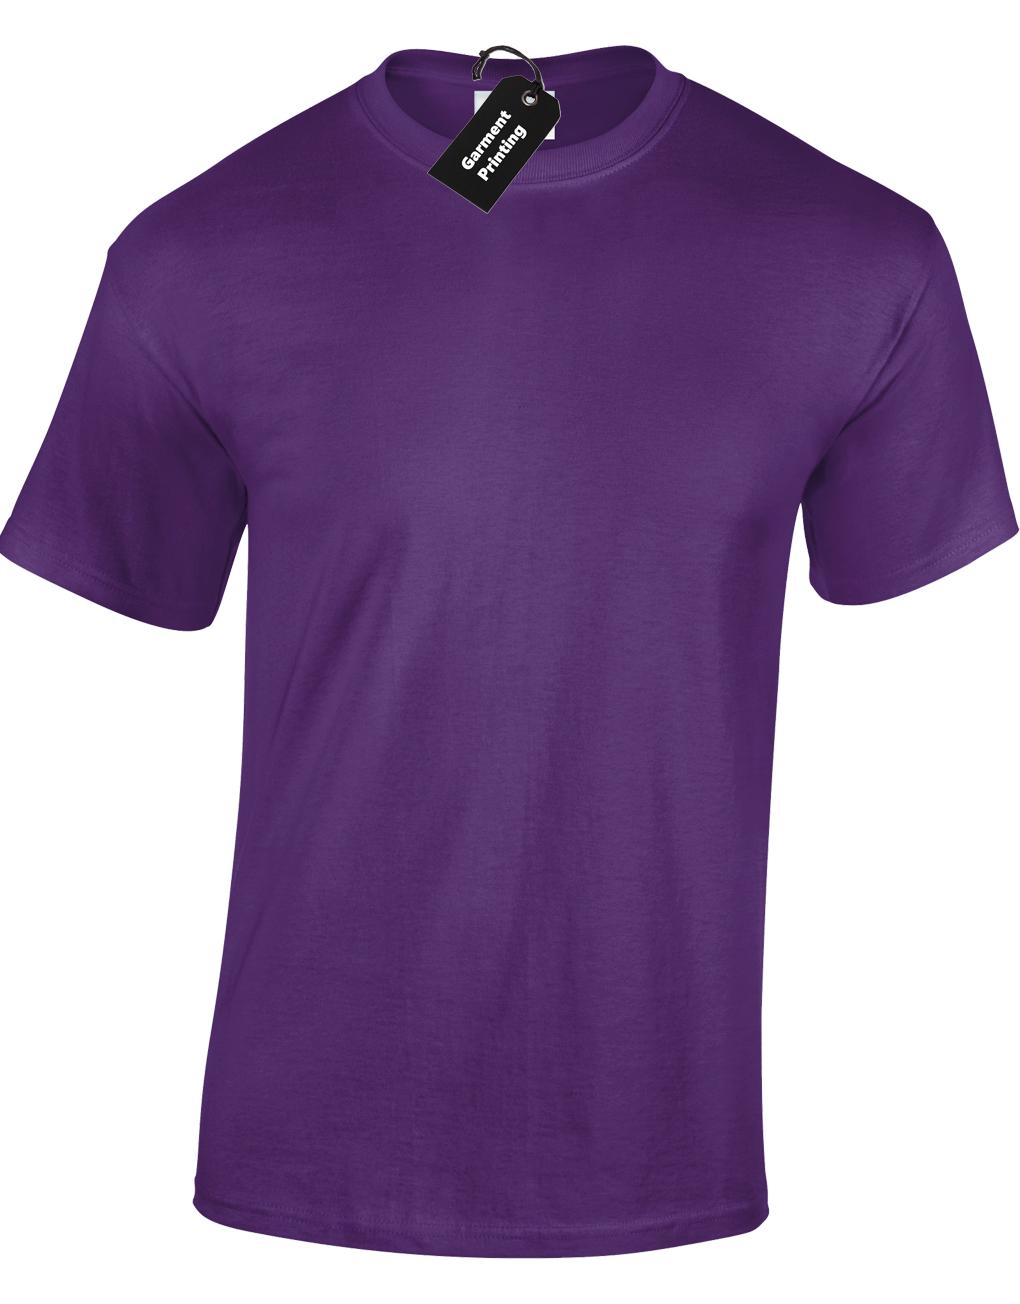 Mens Personalised Printed T-Shirt Unisex Custom Design Logo Uniform Stag Do Fun 6